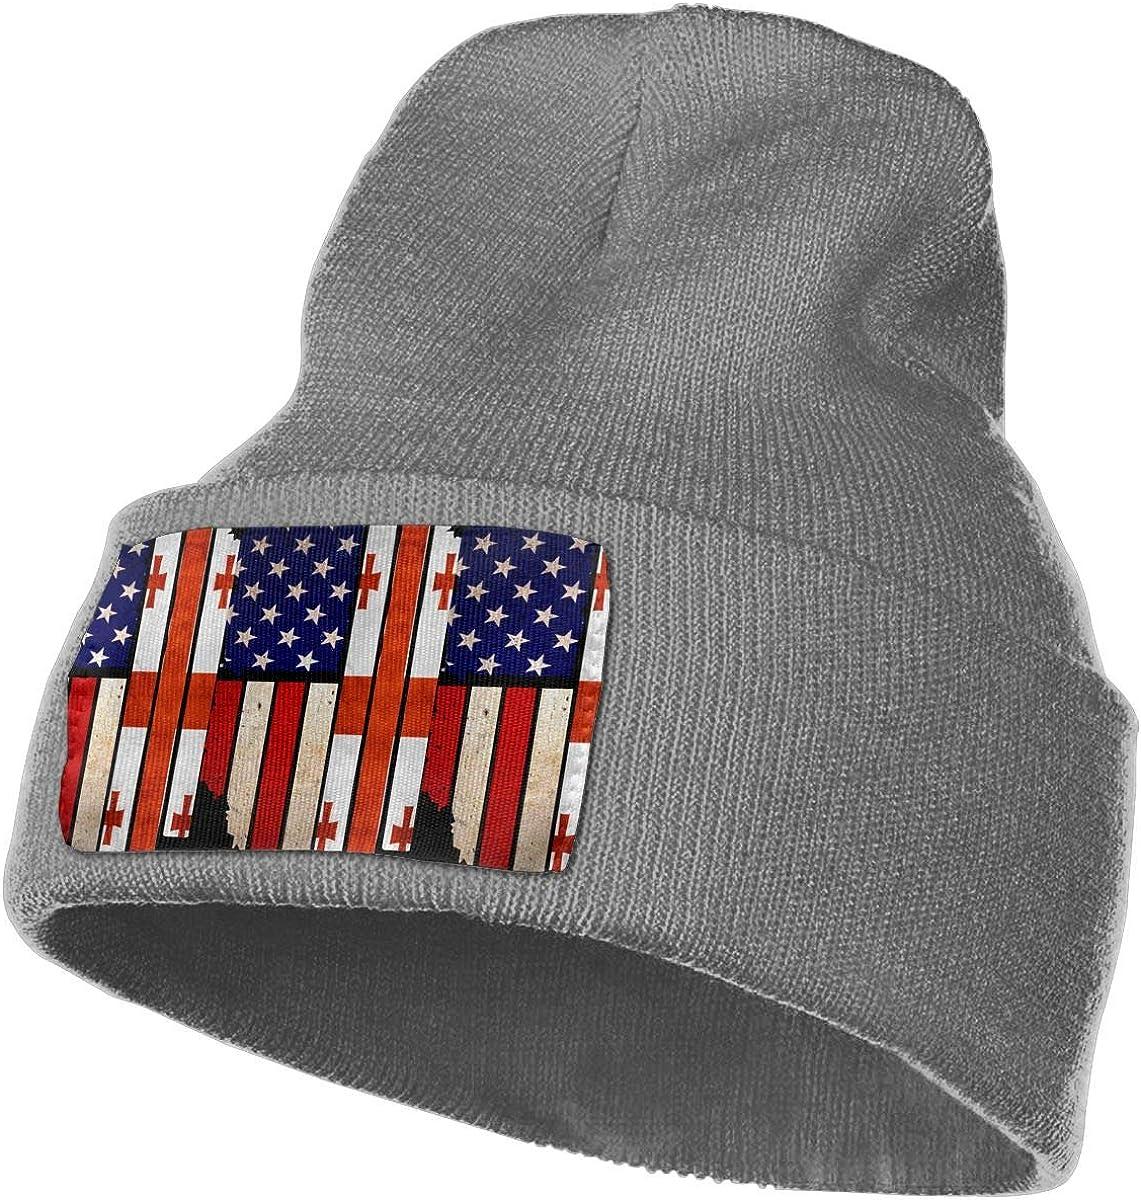 100/% Acrylic Beanie Hat Vintage USA Georgia Flag Warm Knitting Hat Mens Womens